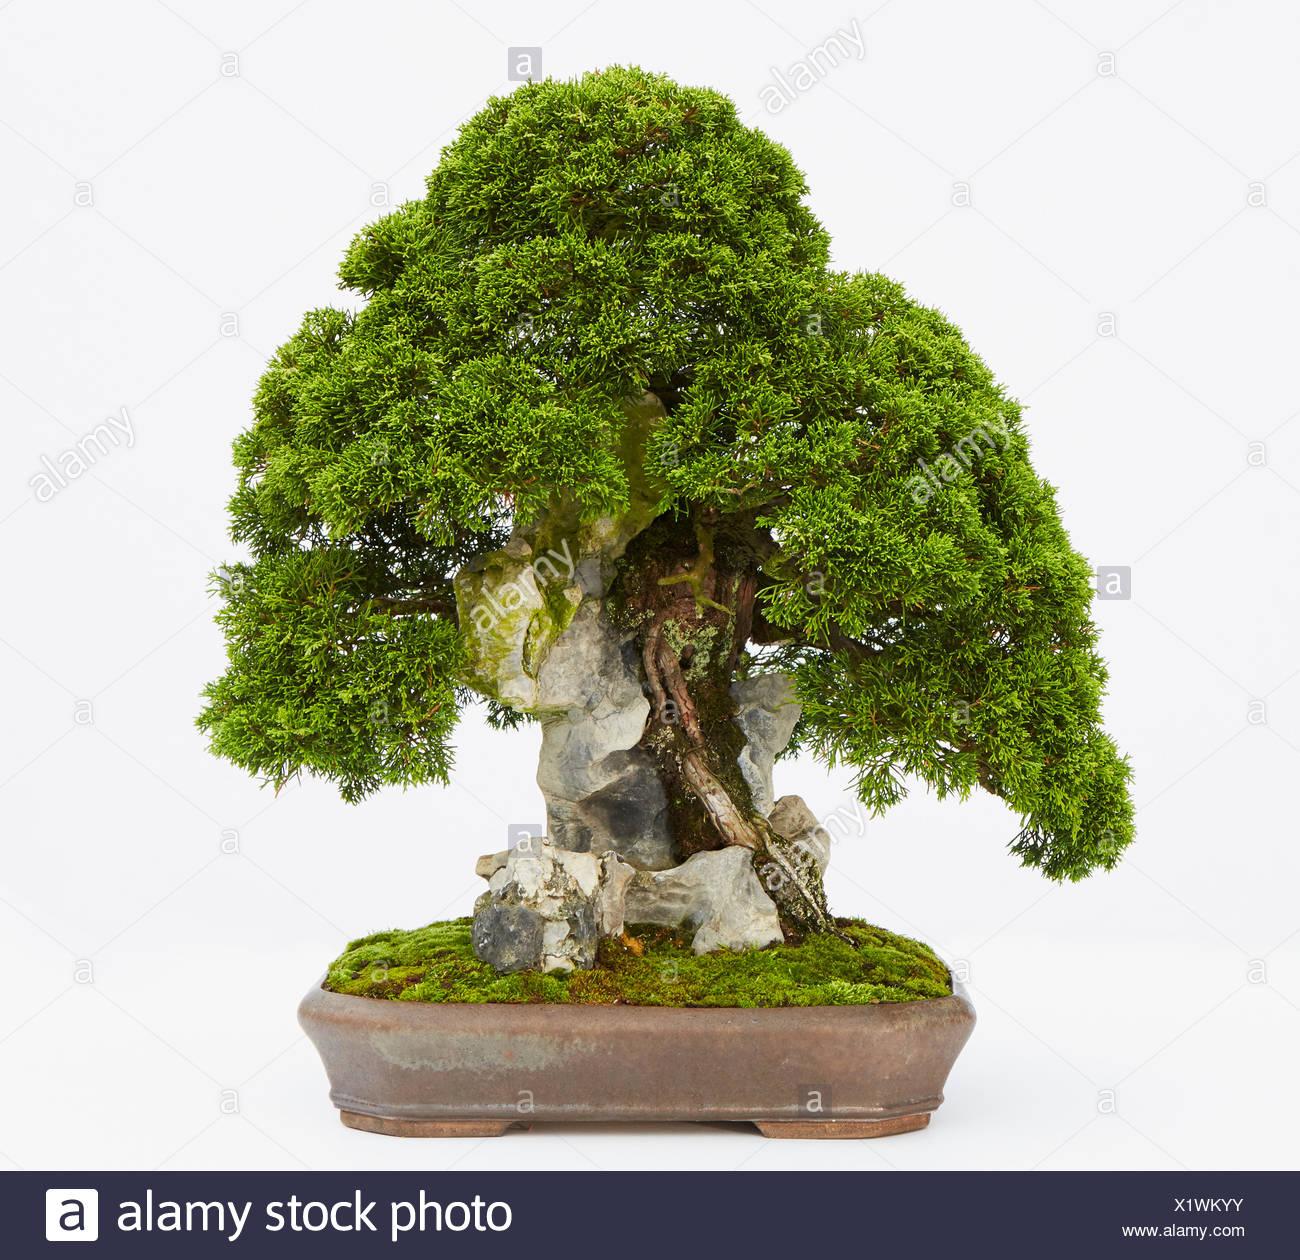 Bonsai Juniperus Chinensis 'Itoigawa' (Chinese Juniper) - Stock Image